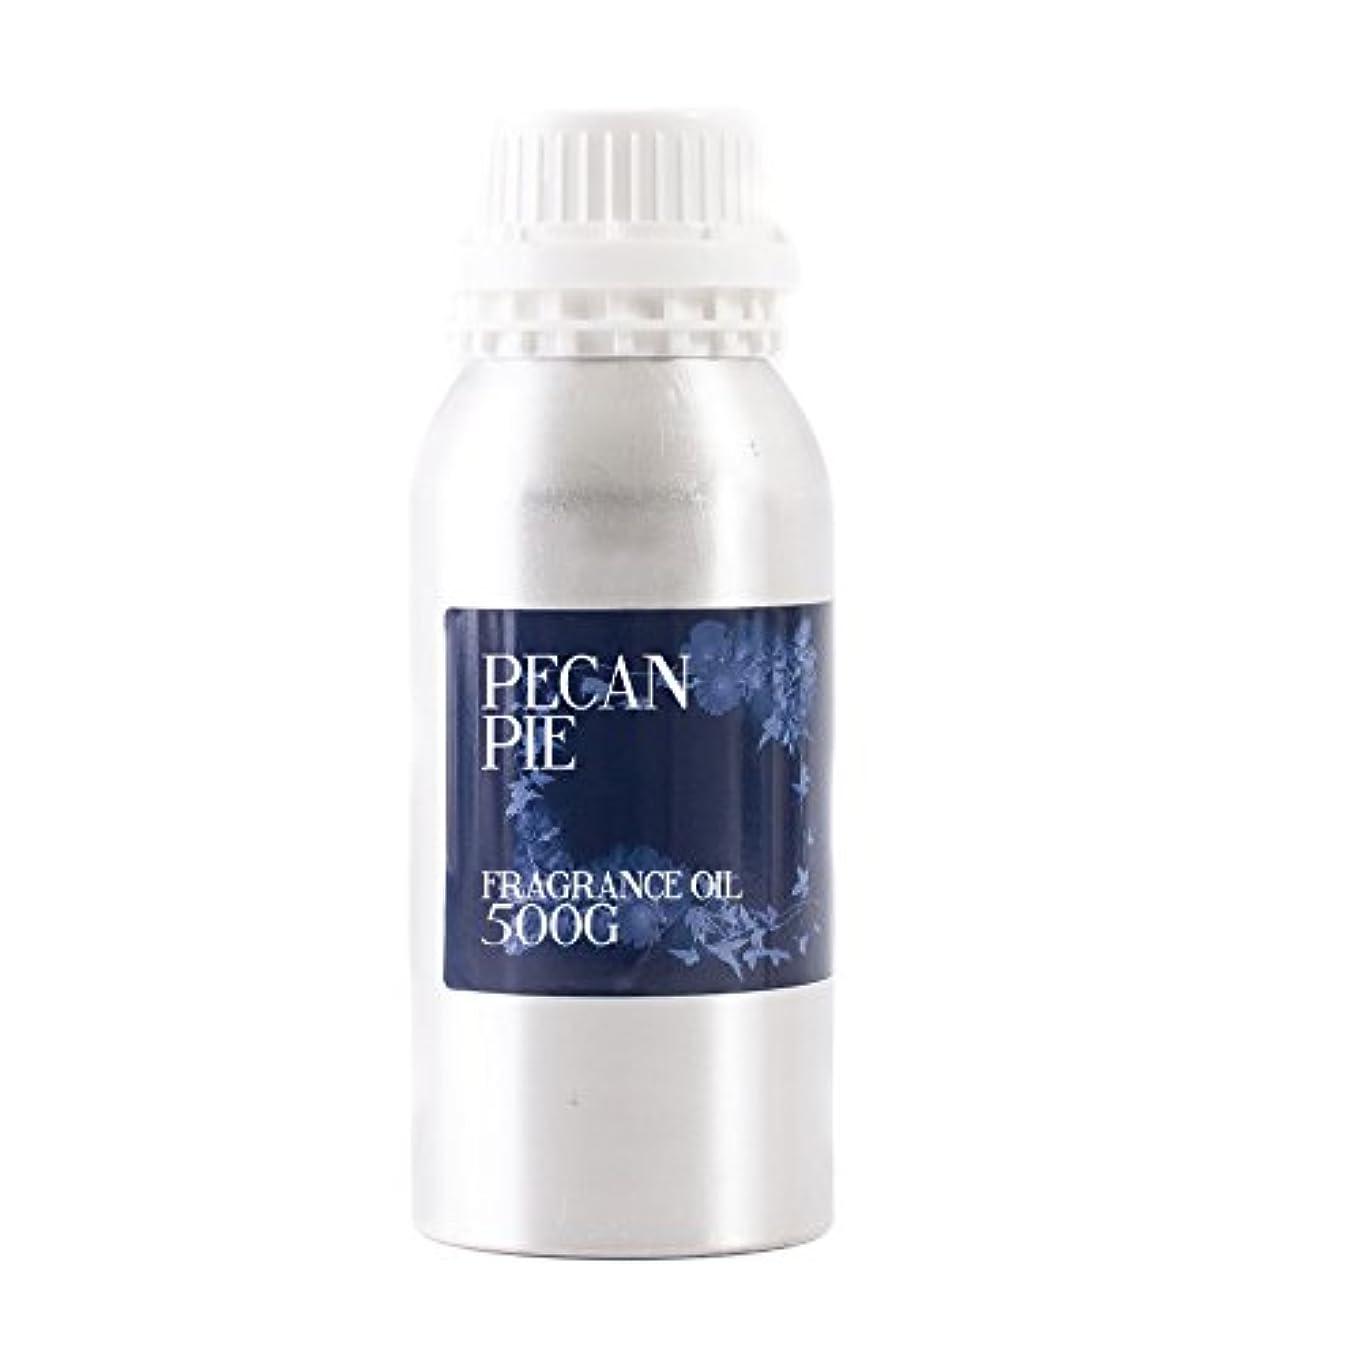 Mystic Moments | Pecan Pie Fragrance Oil - 500g